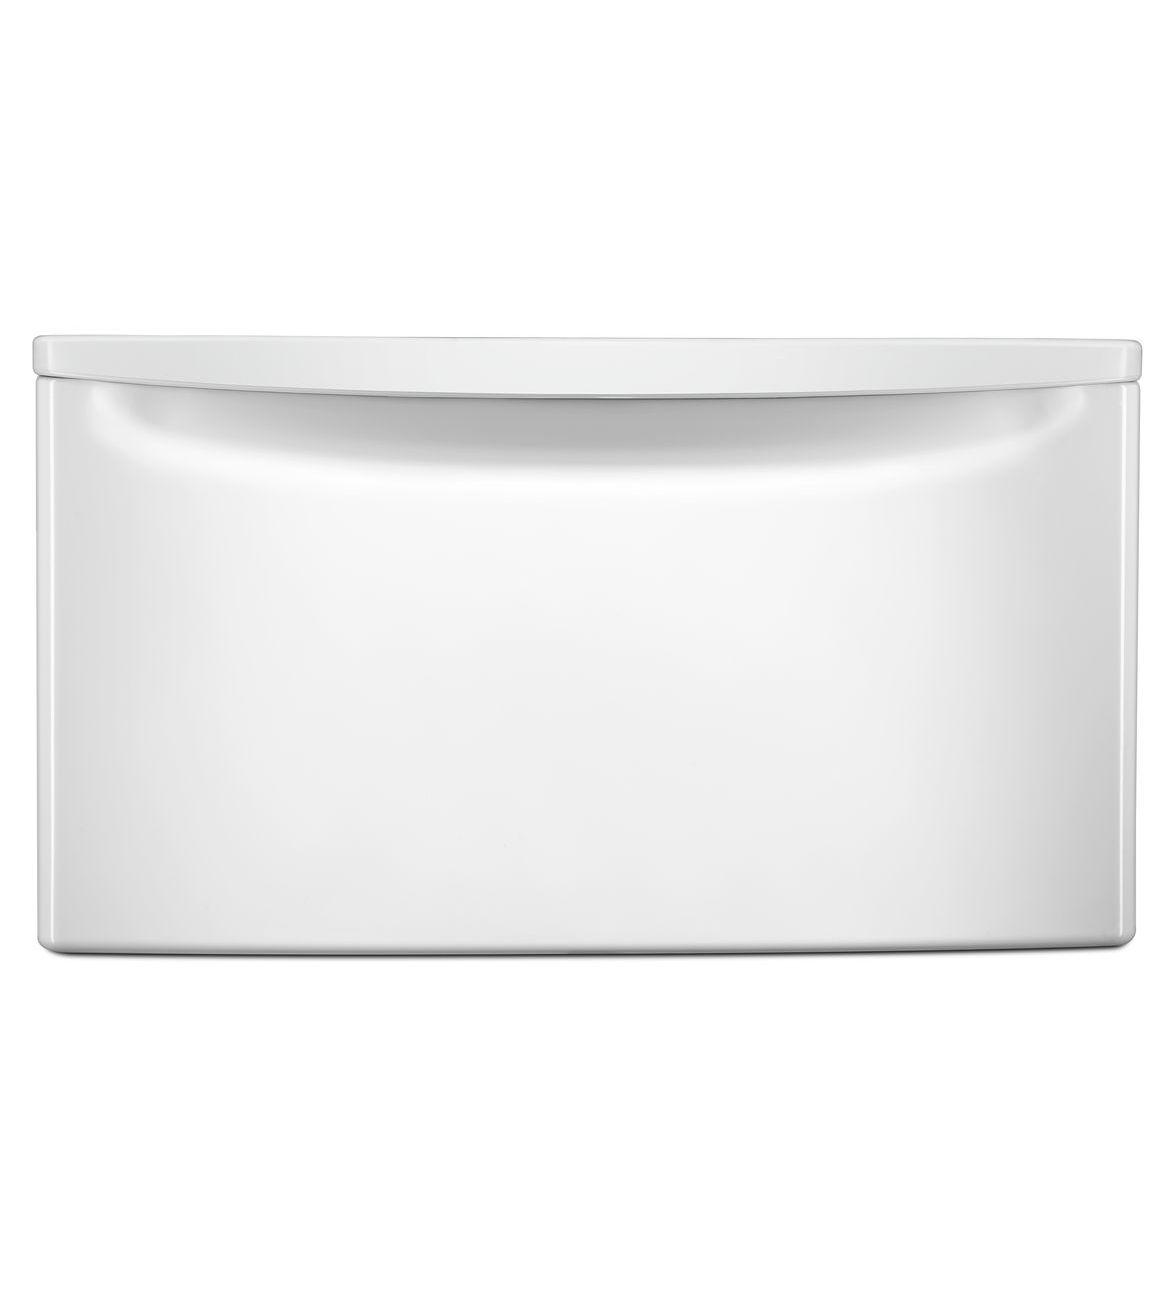 <br/><br/>  Whirlpool 惠而浦 XHPW155DW 滾筒洗衣機抽屜式層座【零利率】※熱線07-7428010<br/><br/>